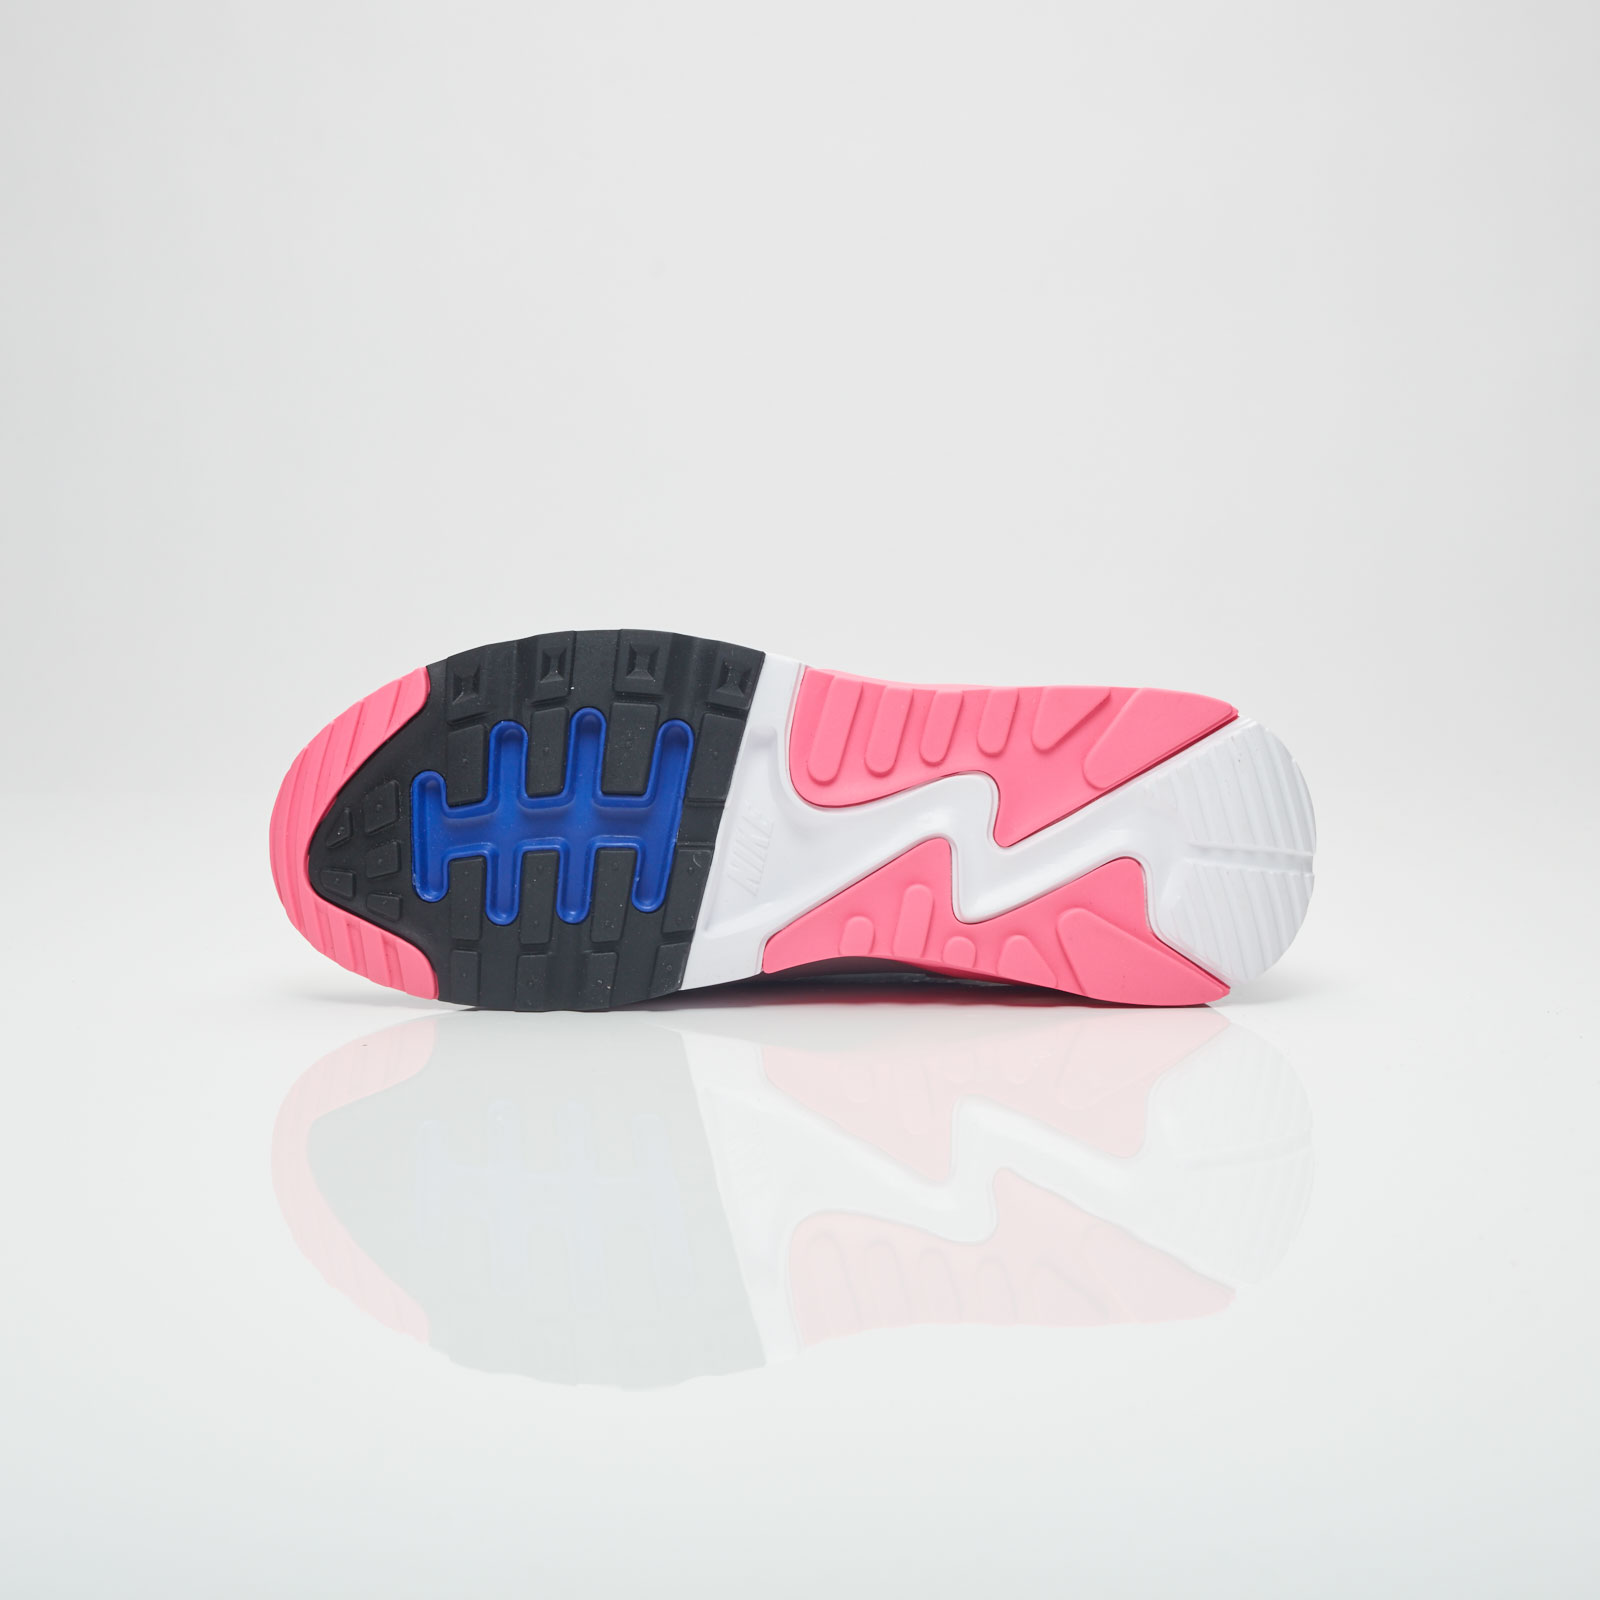 f6043374e92287 Nike Wmns Air Max 90 Ultra 2.0 Flyknit - 881109-101 - Sneakersnstuff ...